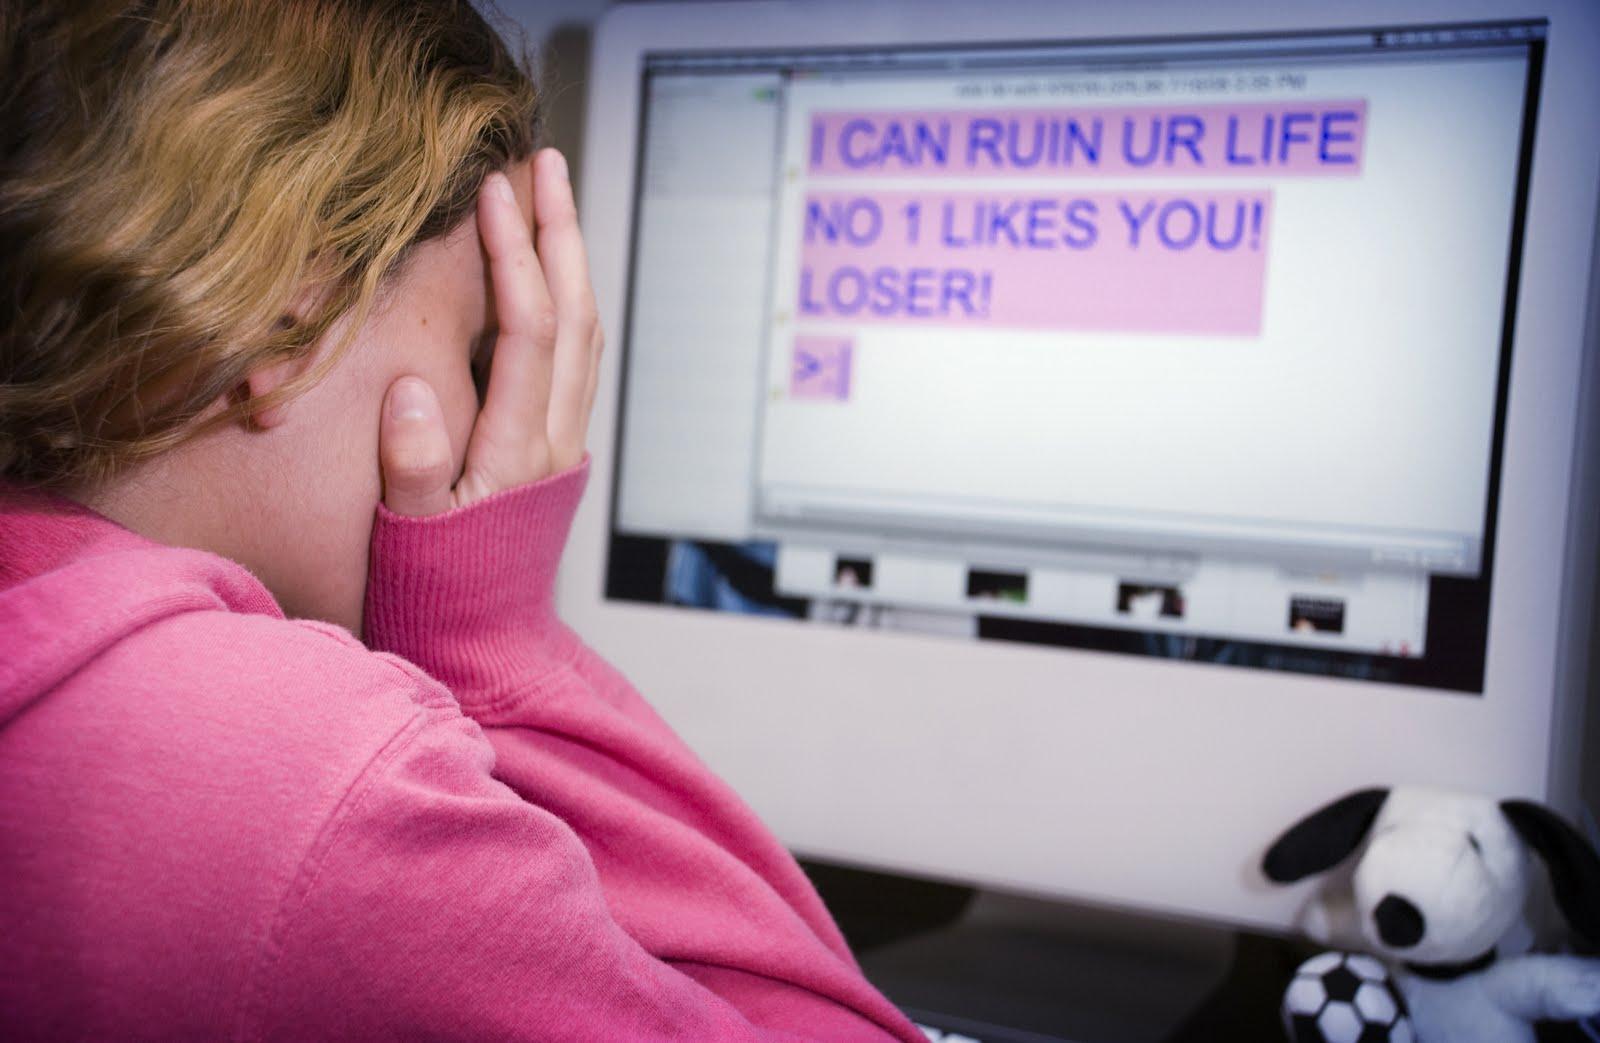 flaming trolling cyberbullying the